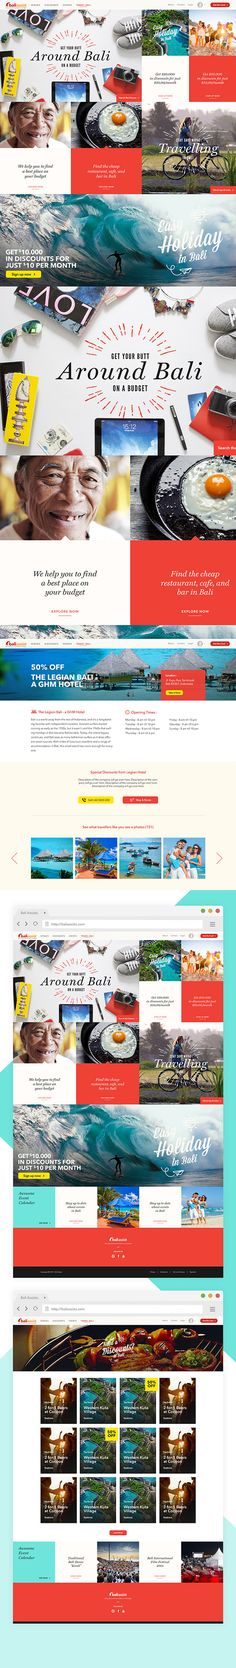 Bali Assist by Firman Suci Ananda, via Behance